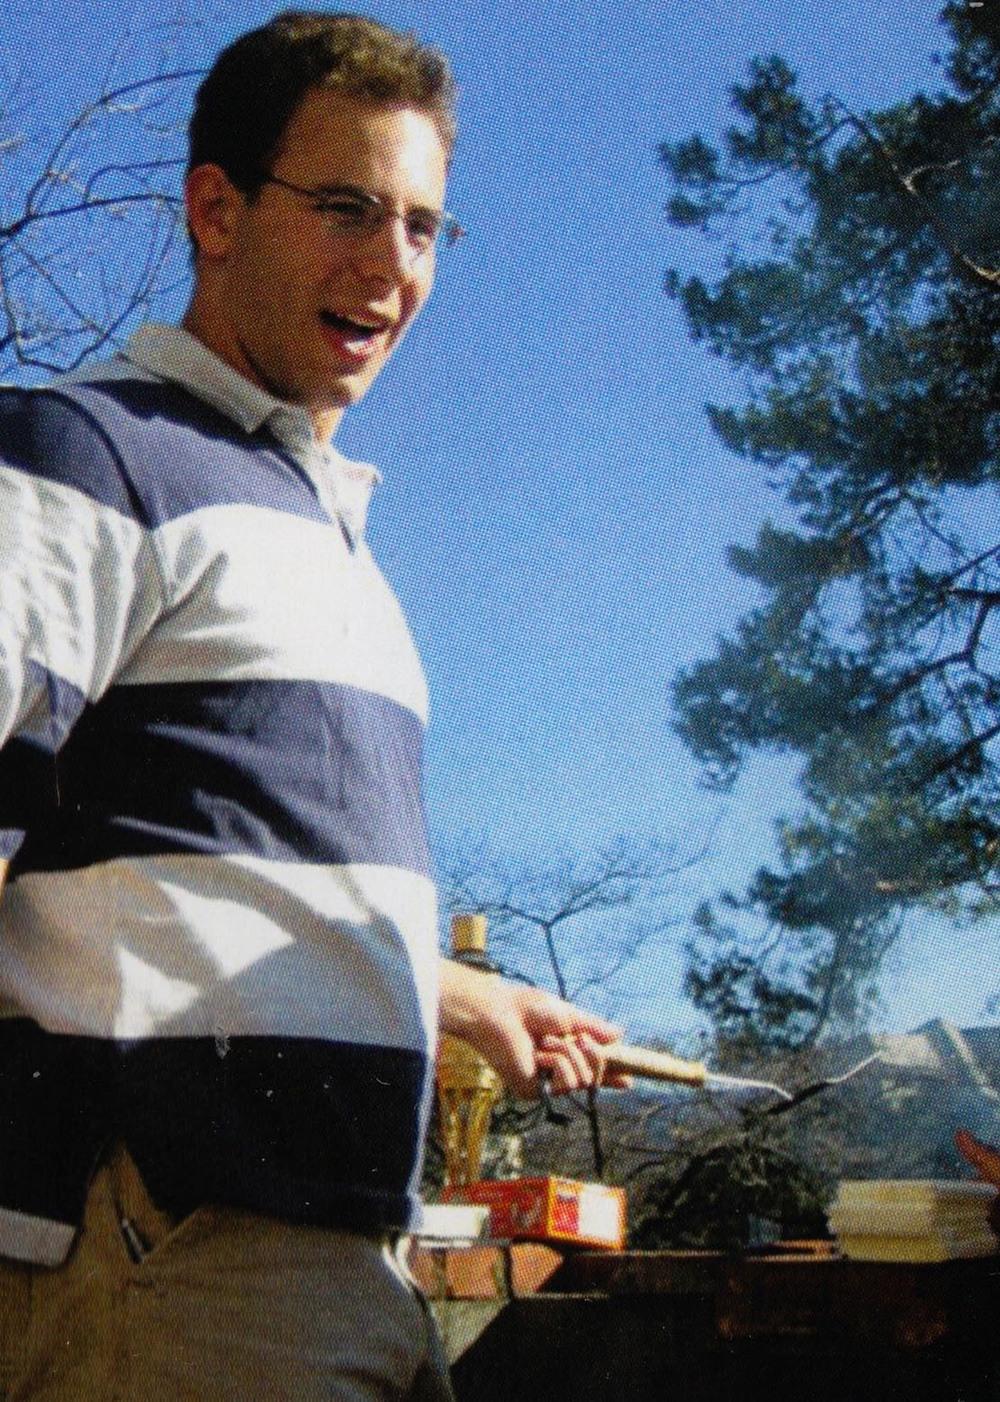 Dave Gendelman2006 Springtime cookout